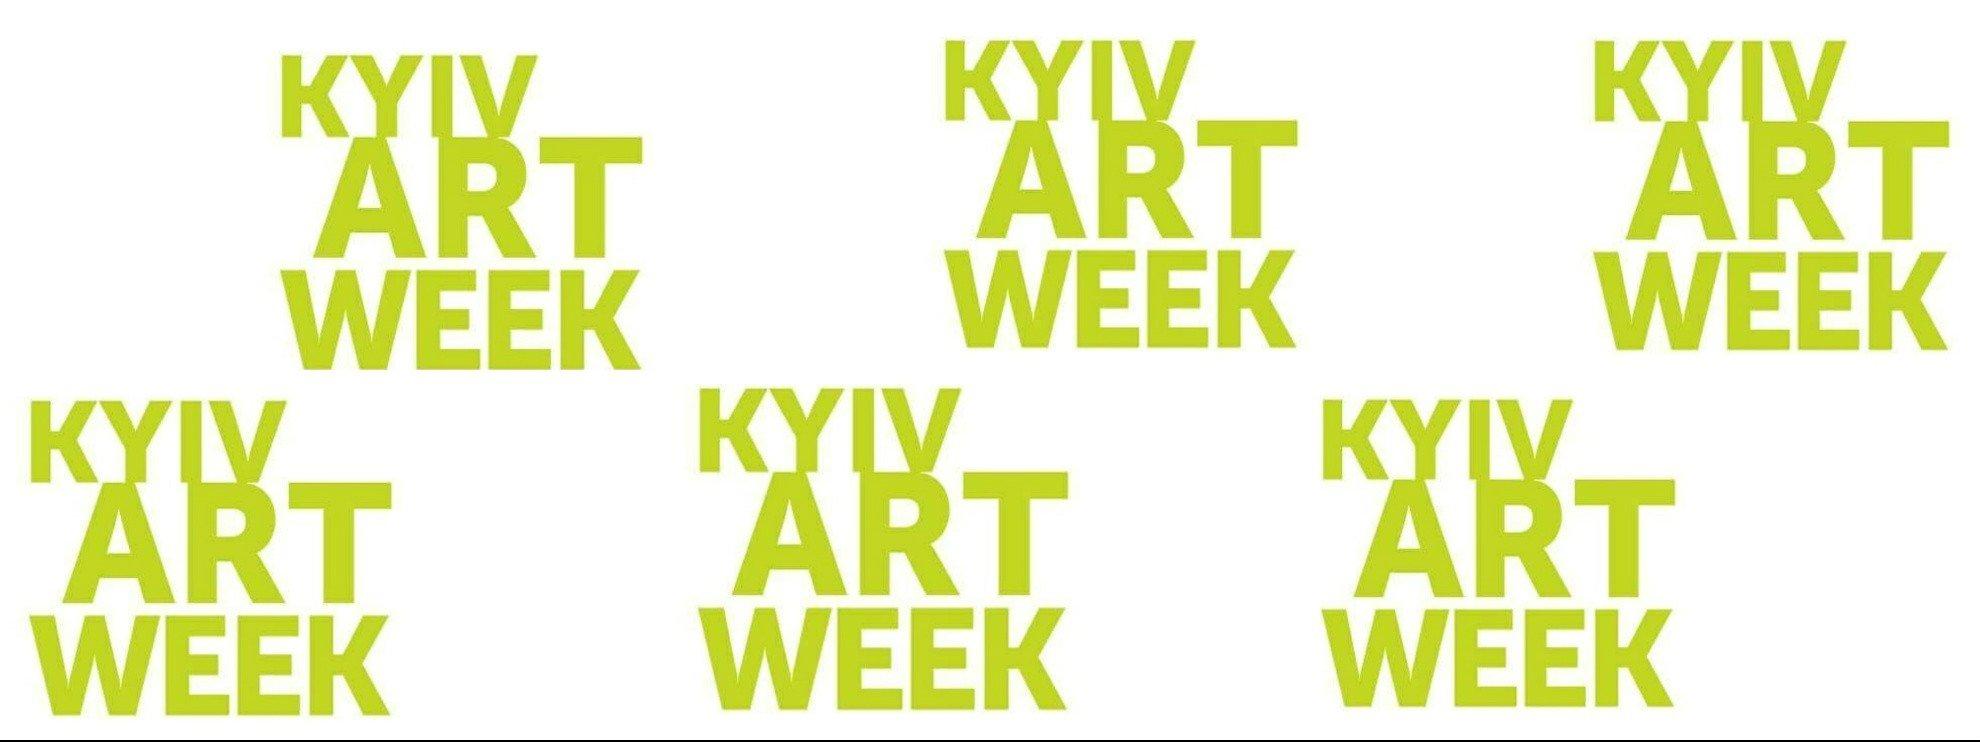 виконавець Кyiv Art Week (Київ Арт Уїк)